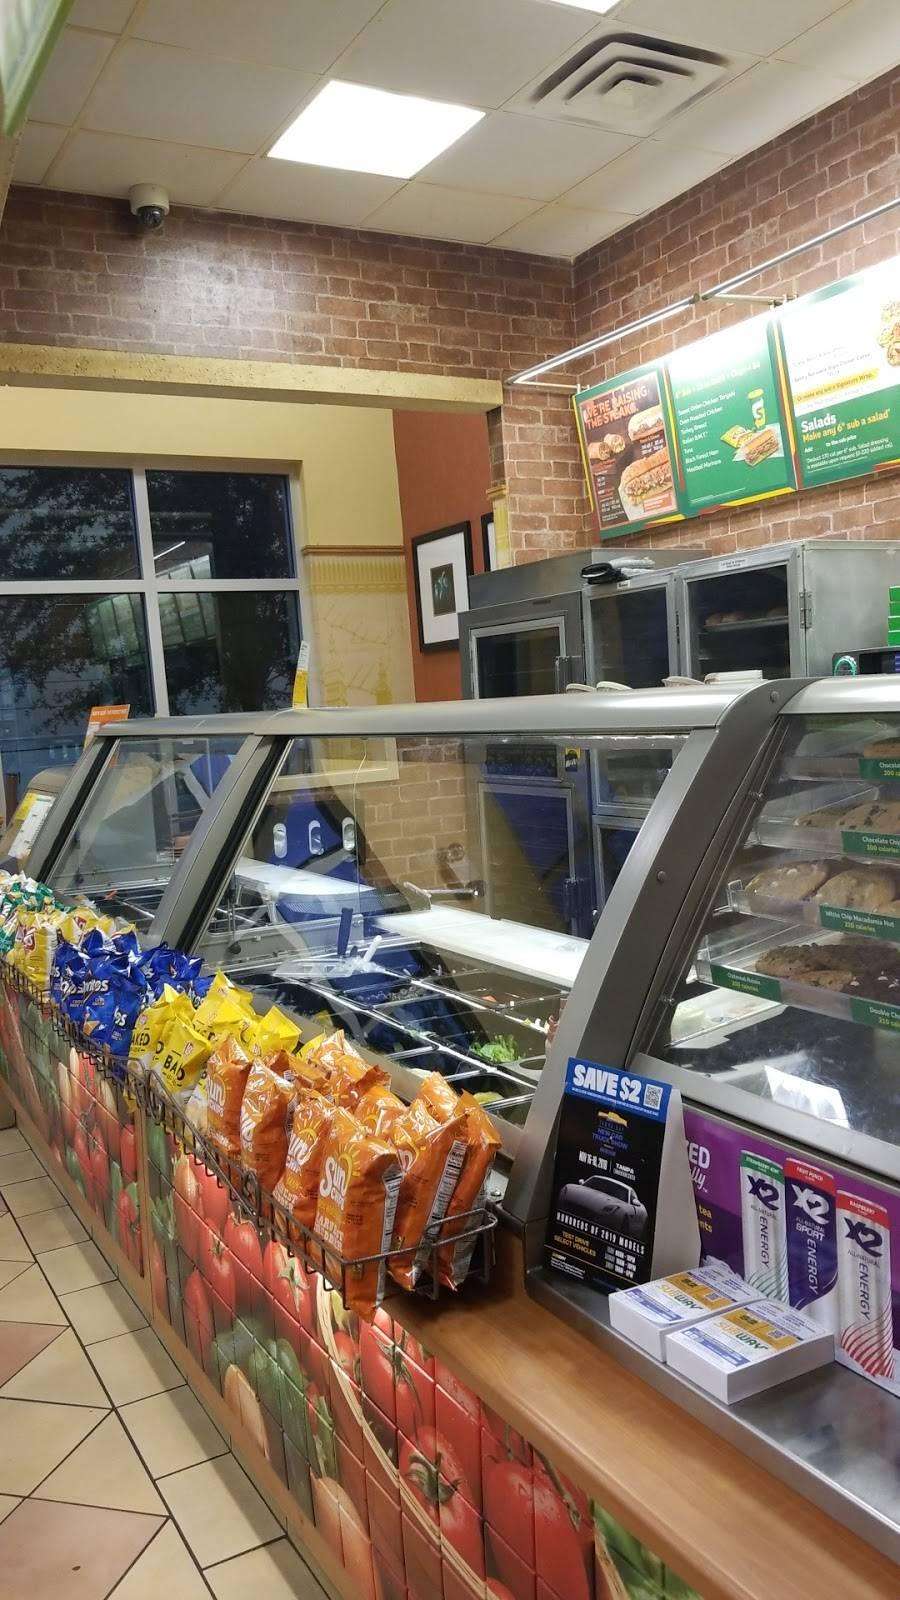 Subway Restaurants   restaurant   41220 US Hwy 19 N, Tarpon Springs, FL 34689, USA   7279385400 OR +1 727-938-5400